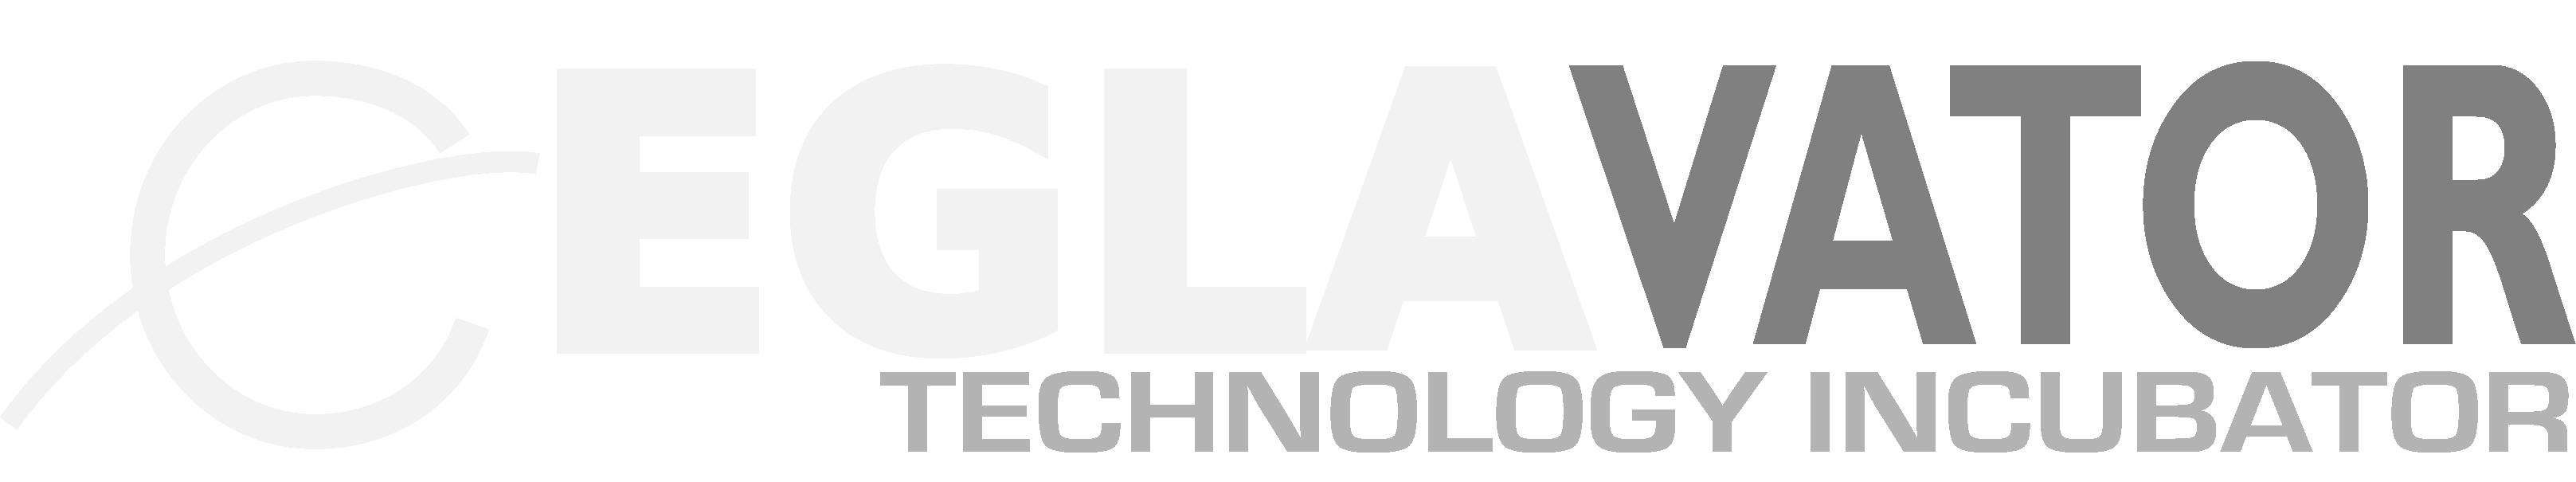 EGLAVATOR – Technology Incubator